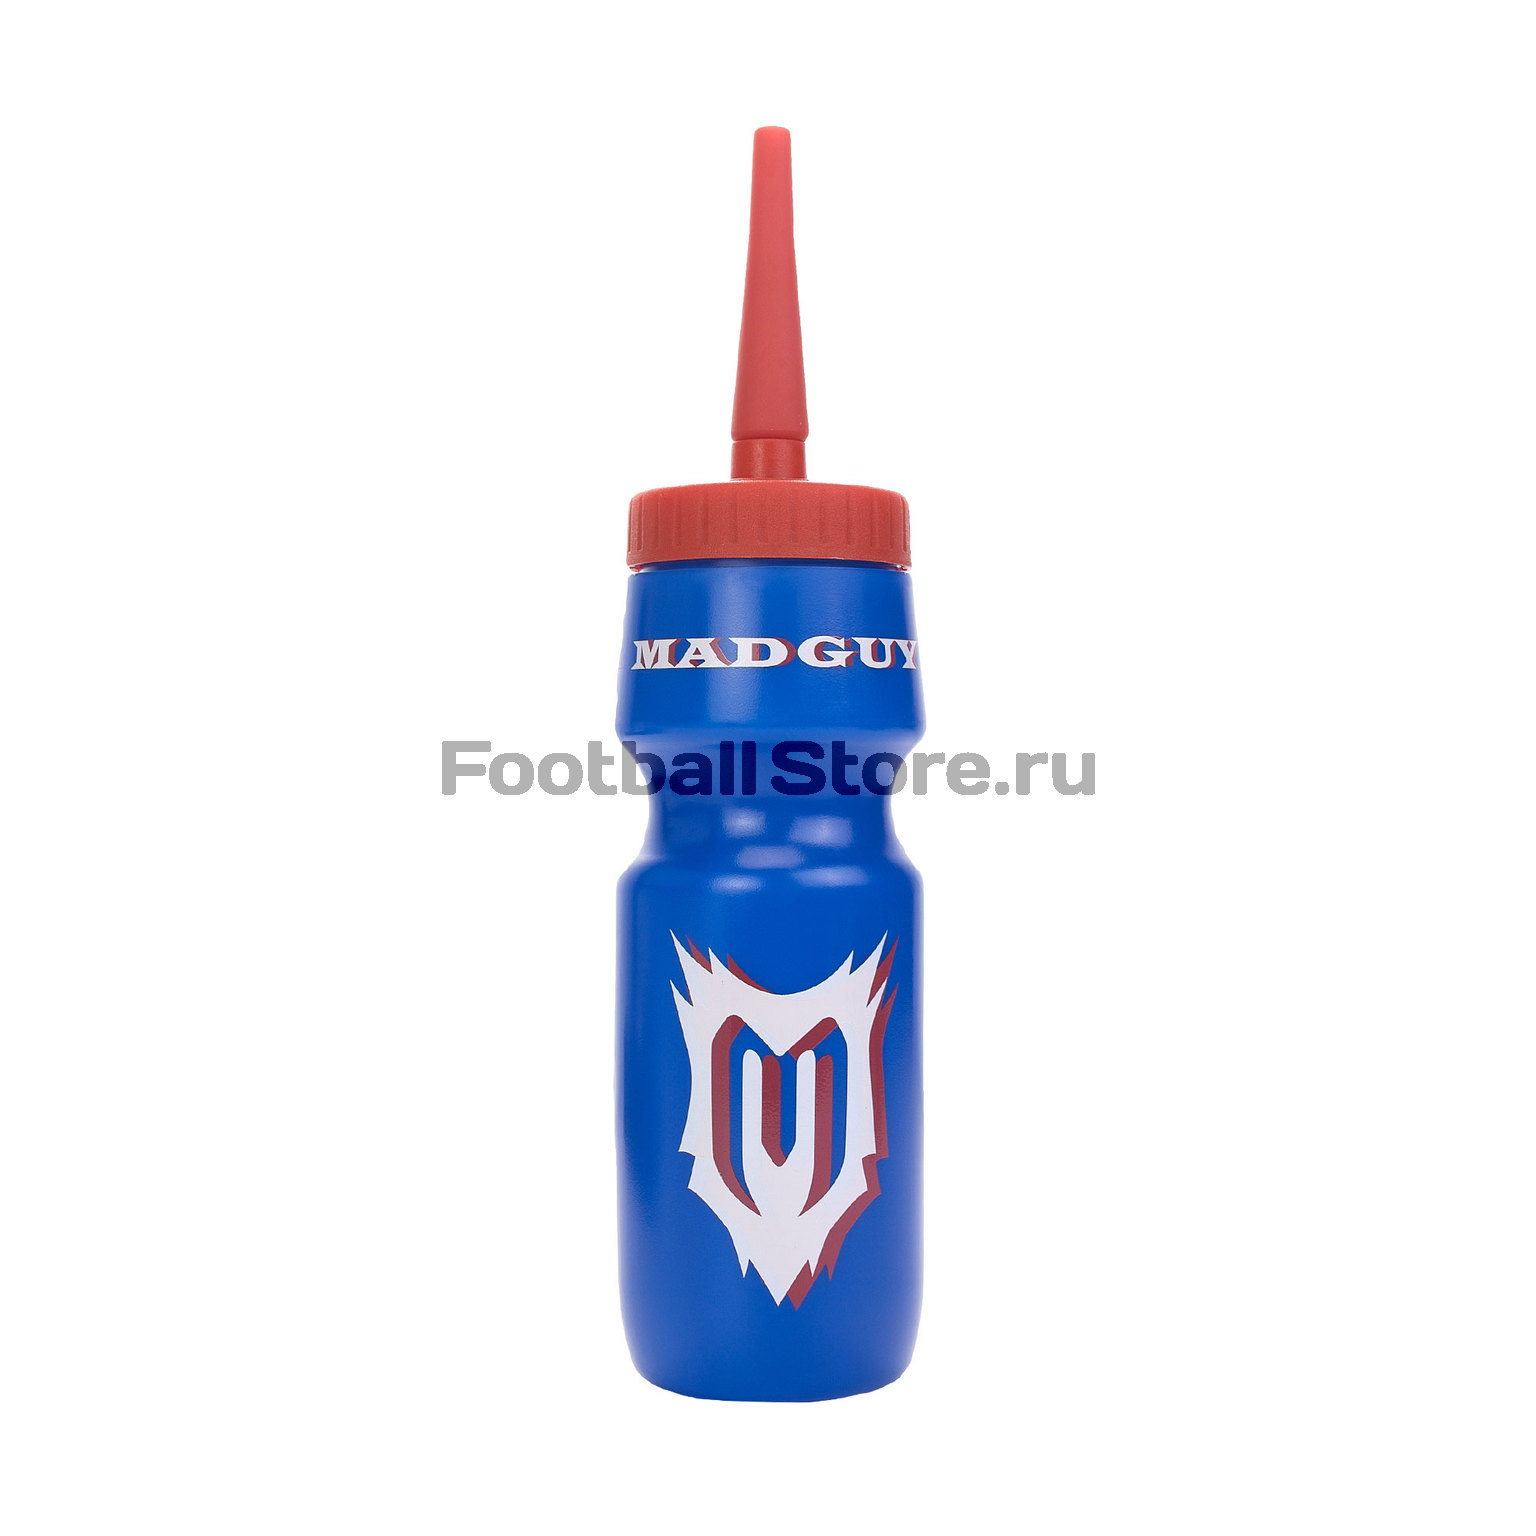 Бутылочка для воды Mad Guy 700 мл (синяя)